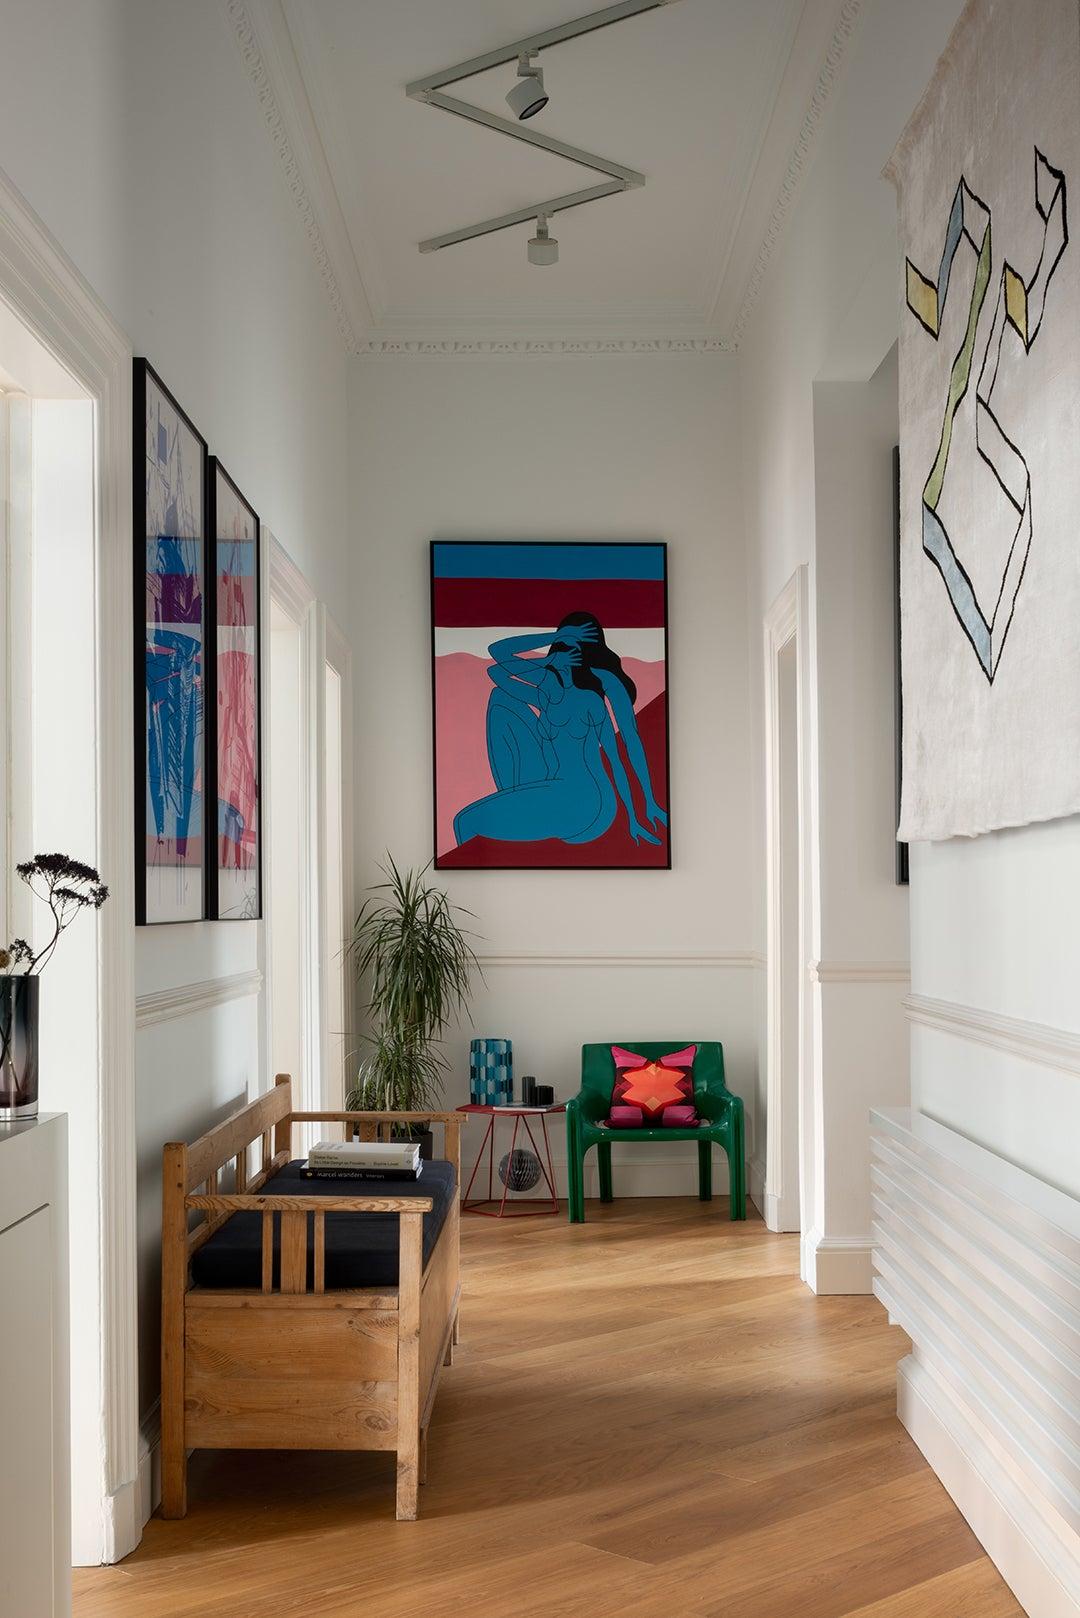 Gallery-style hallway in Sam Buckley's Edinburgh apartment